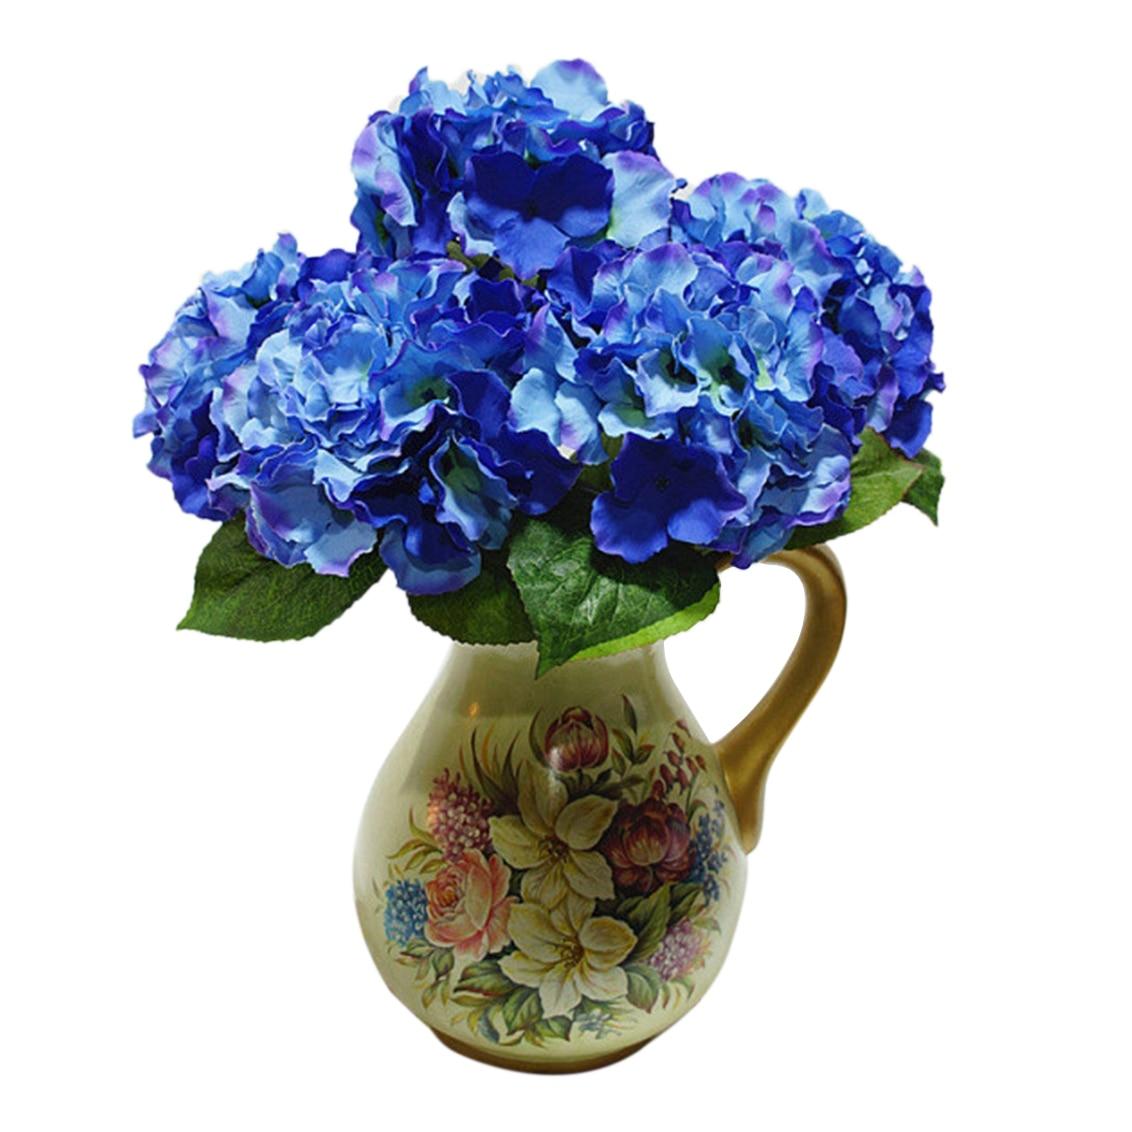 Botique Artificial Hydrangea 5 Flower Heads Bouquet